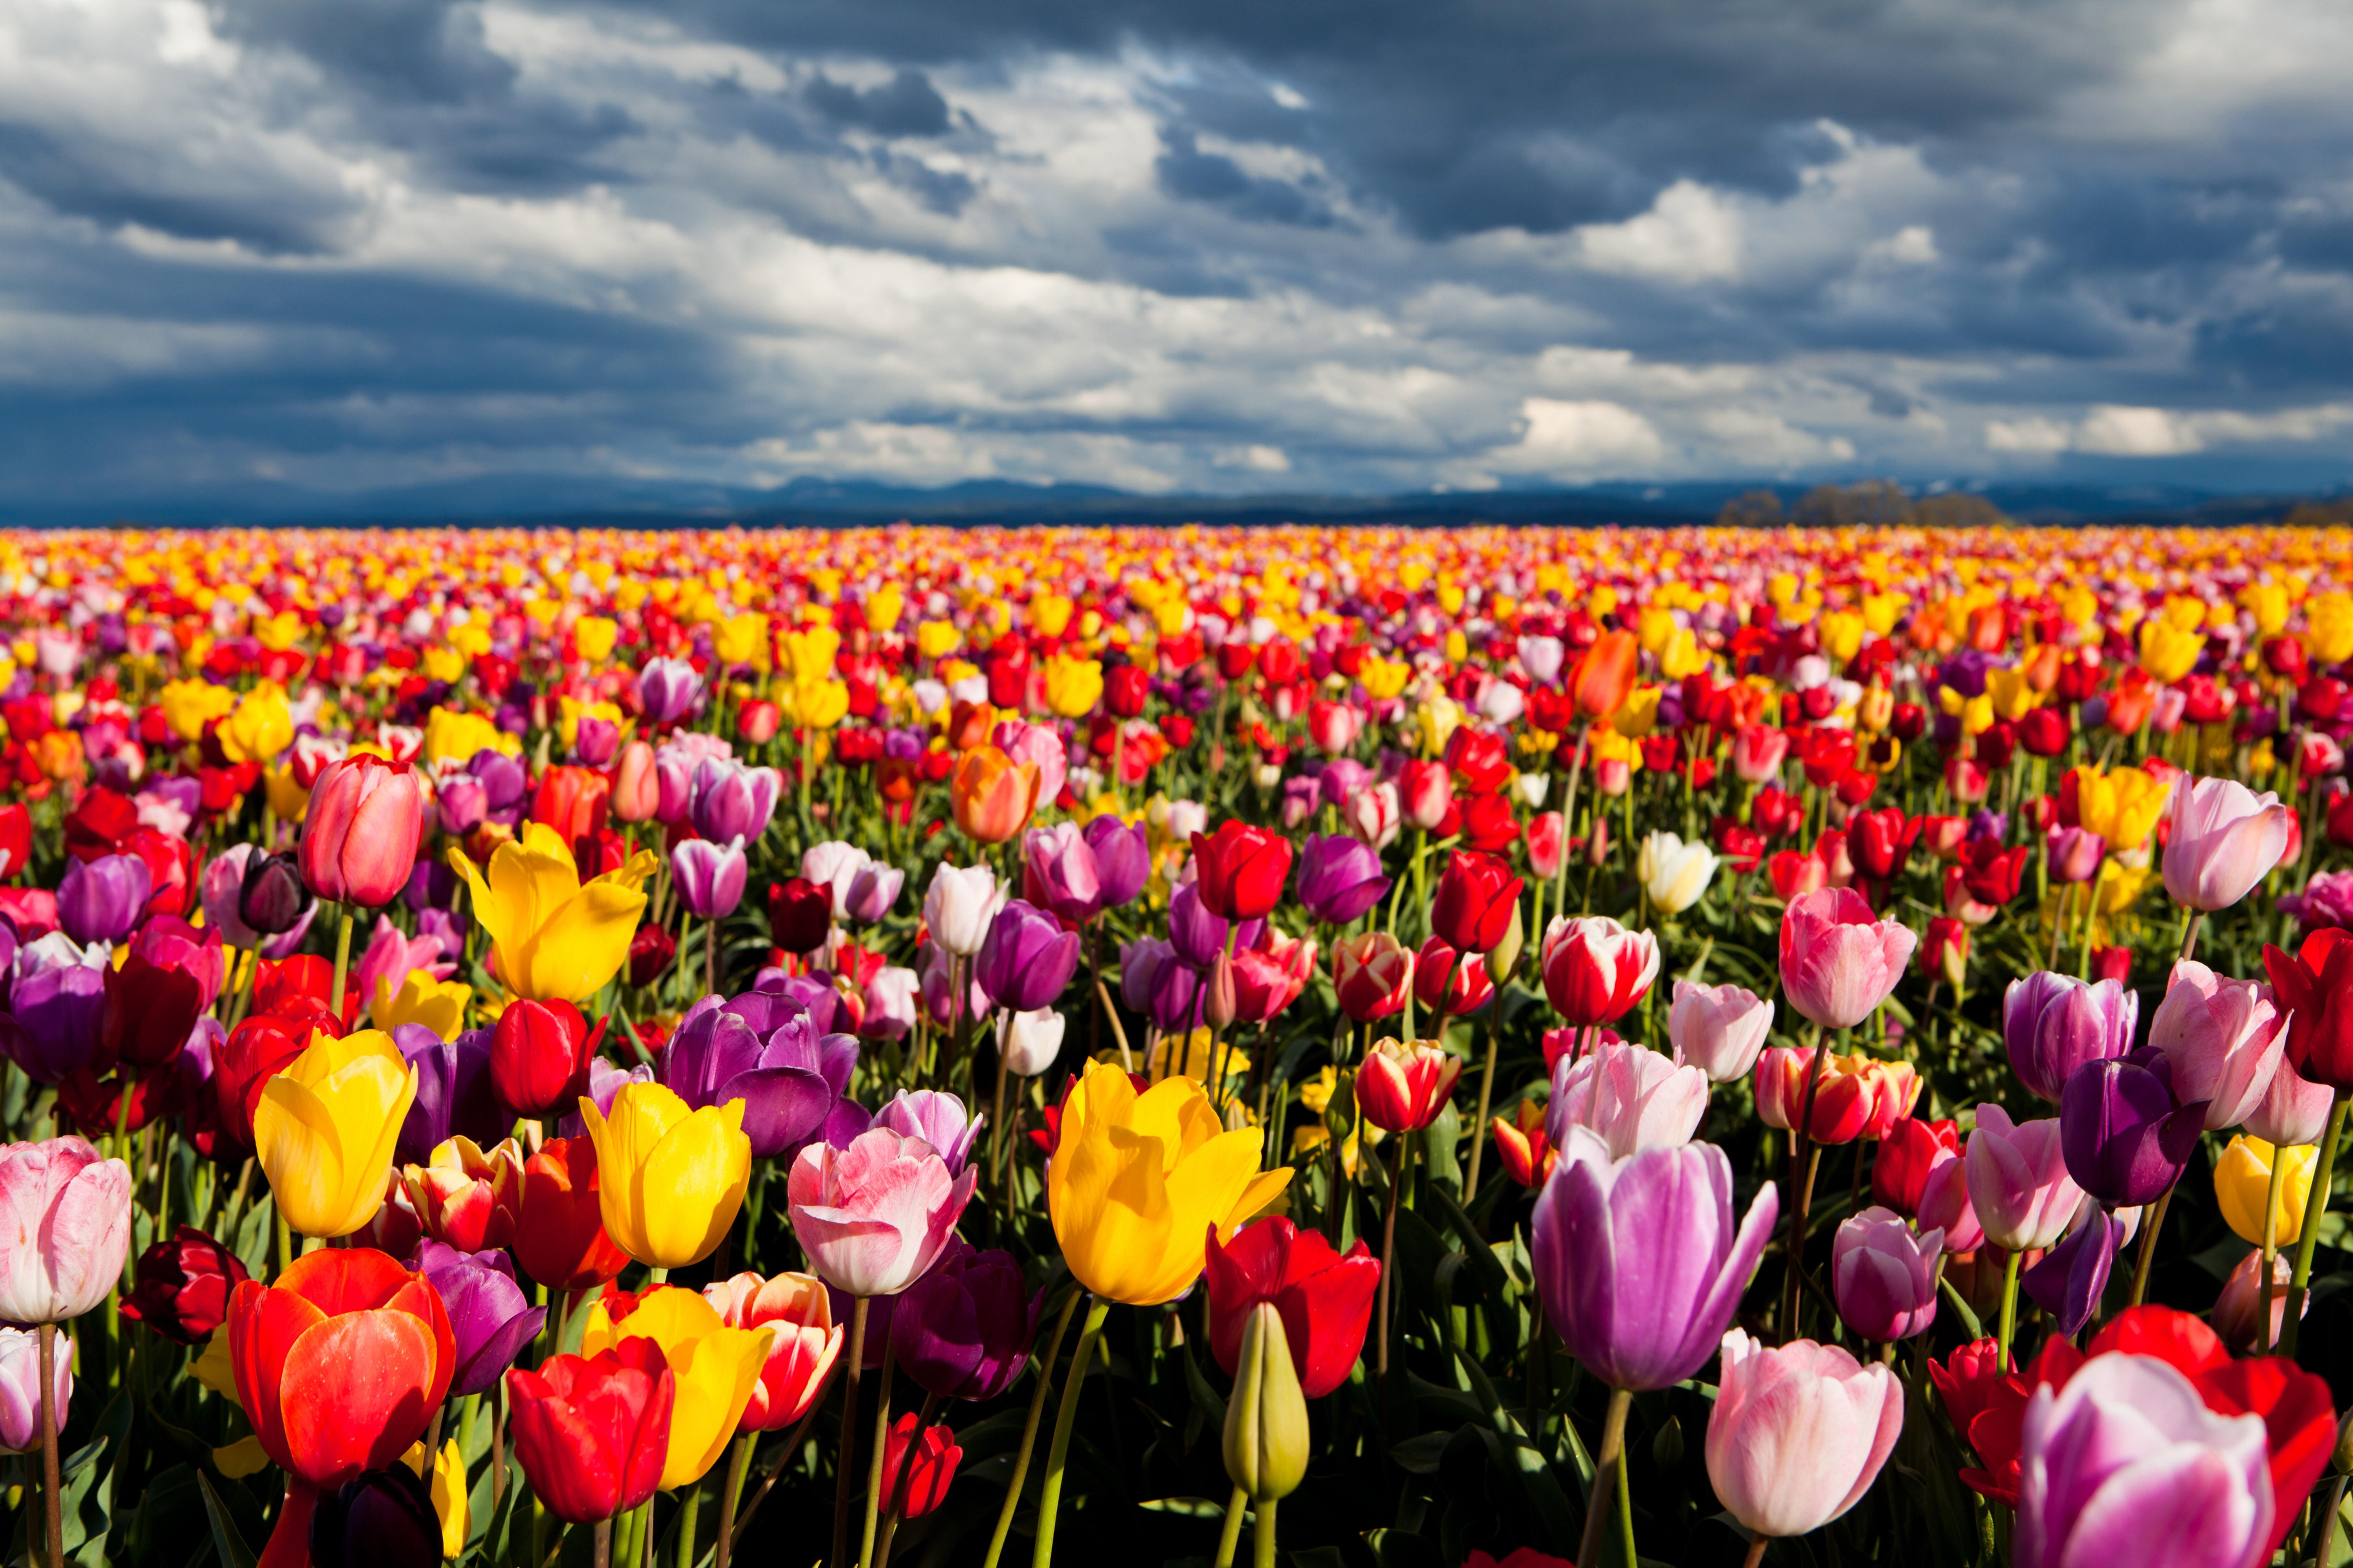 Pink And Yellow Tulips Wallpapers HD : Flower Wallpaper - Zarofil.com